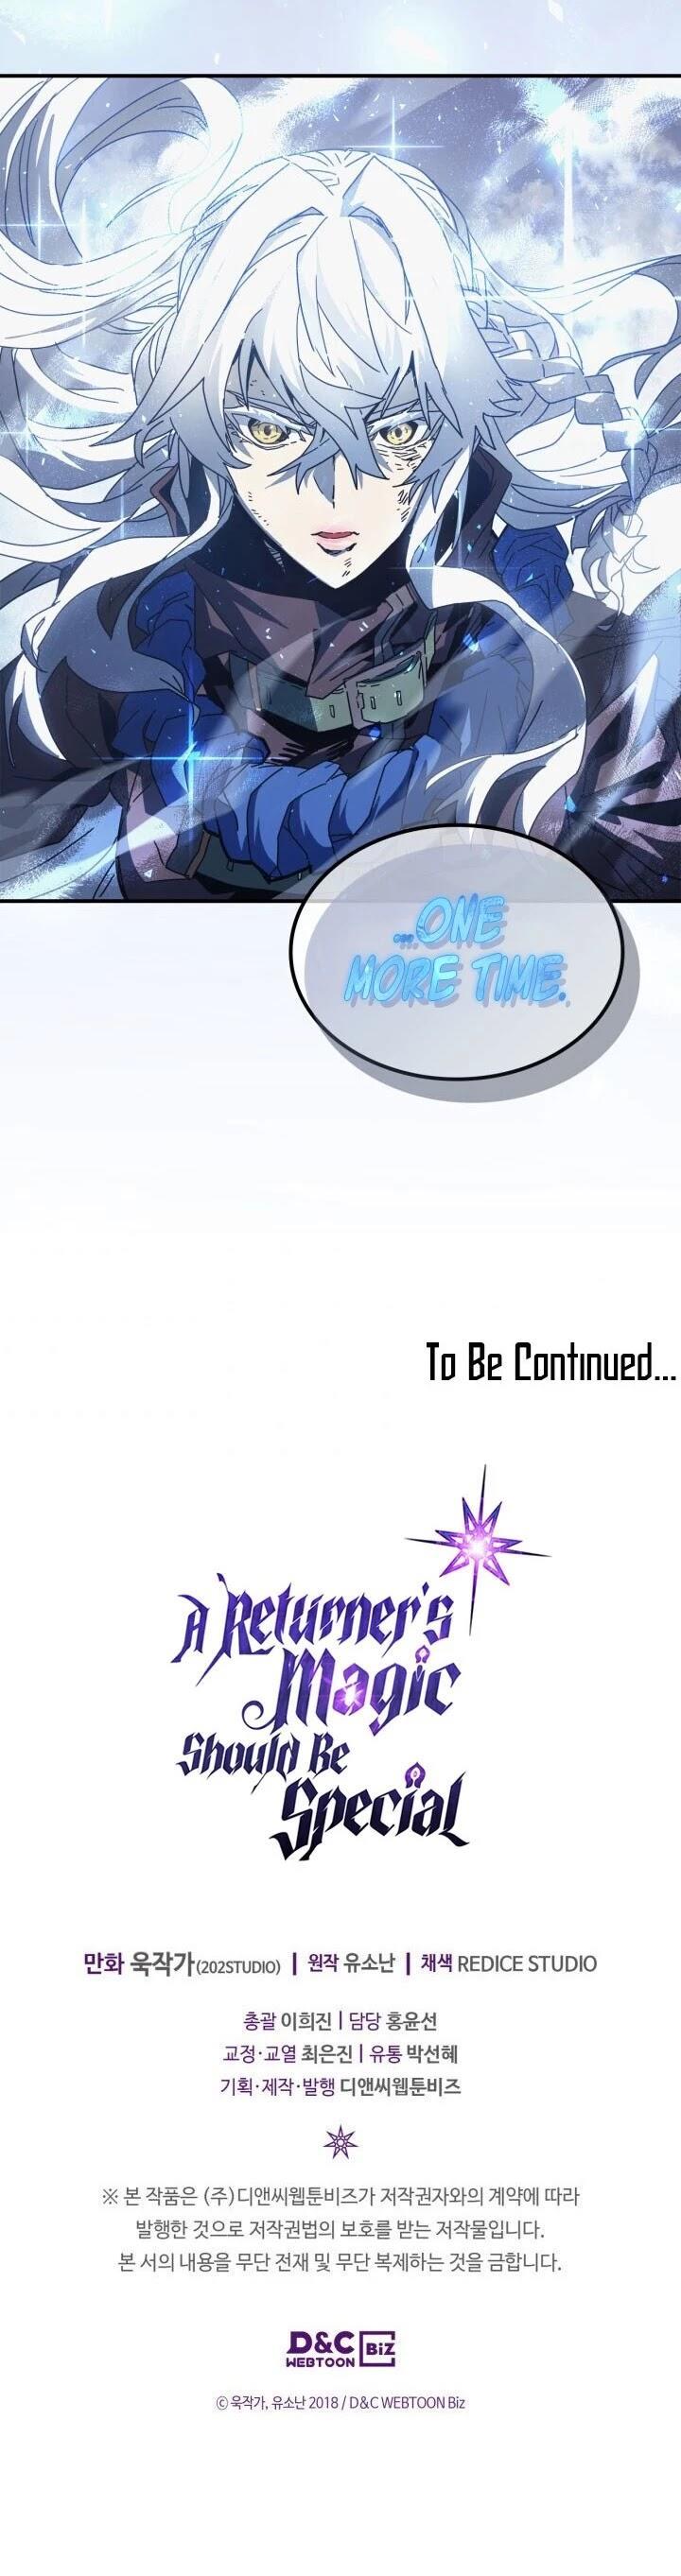 A Returner's Magic Should Be Special Chapter 152 page 52 - Mangakakalots.com